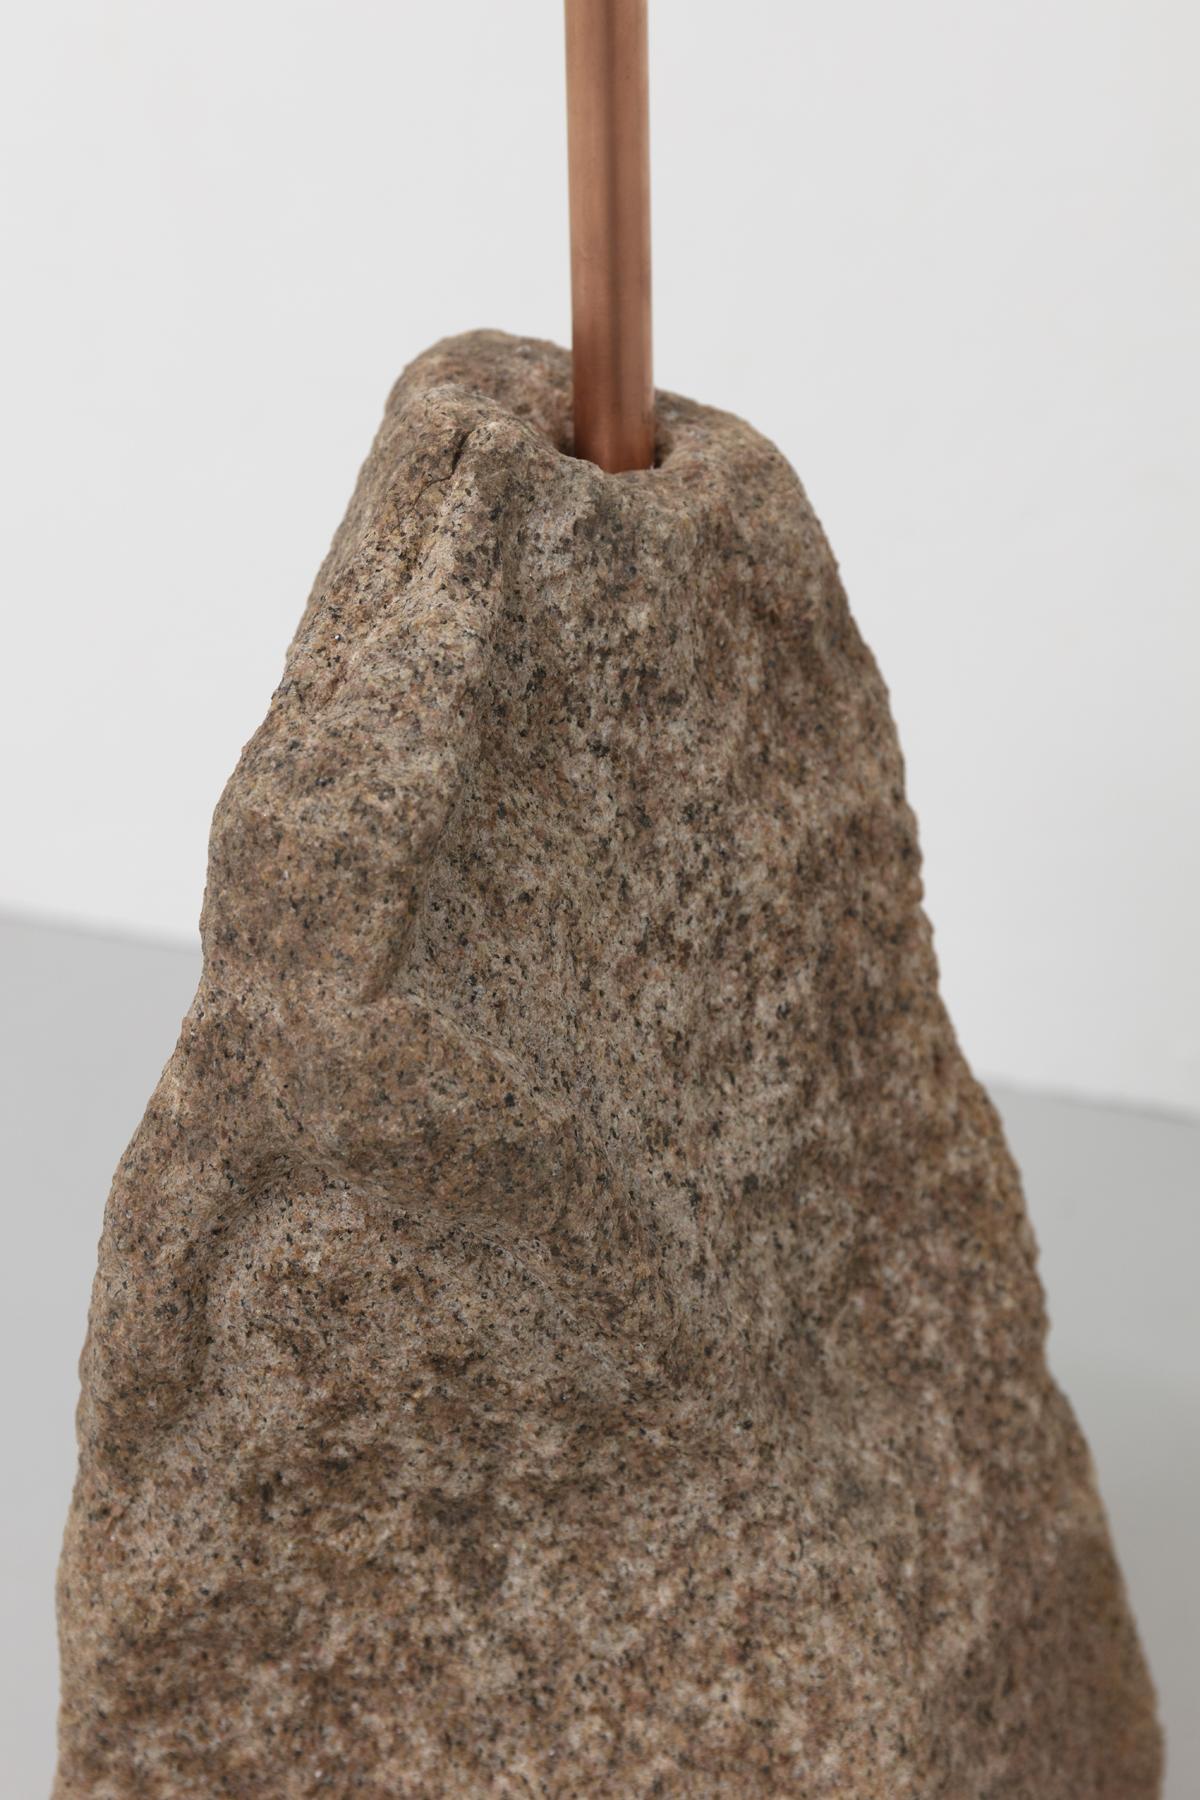 Detal) Berget /The Montain, 2020 Copper, granite, sterling silver 925 183 cm, basen: ca 20 x 20 cm